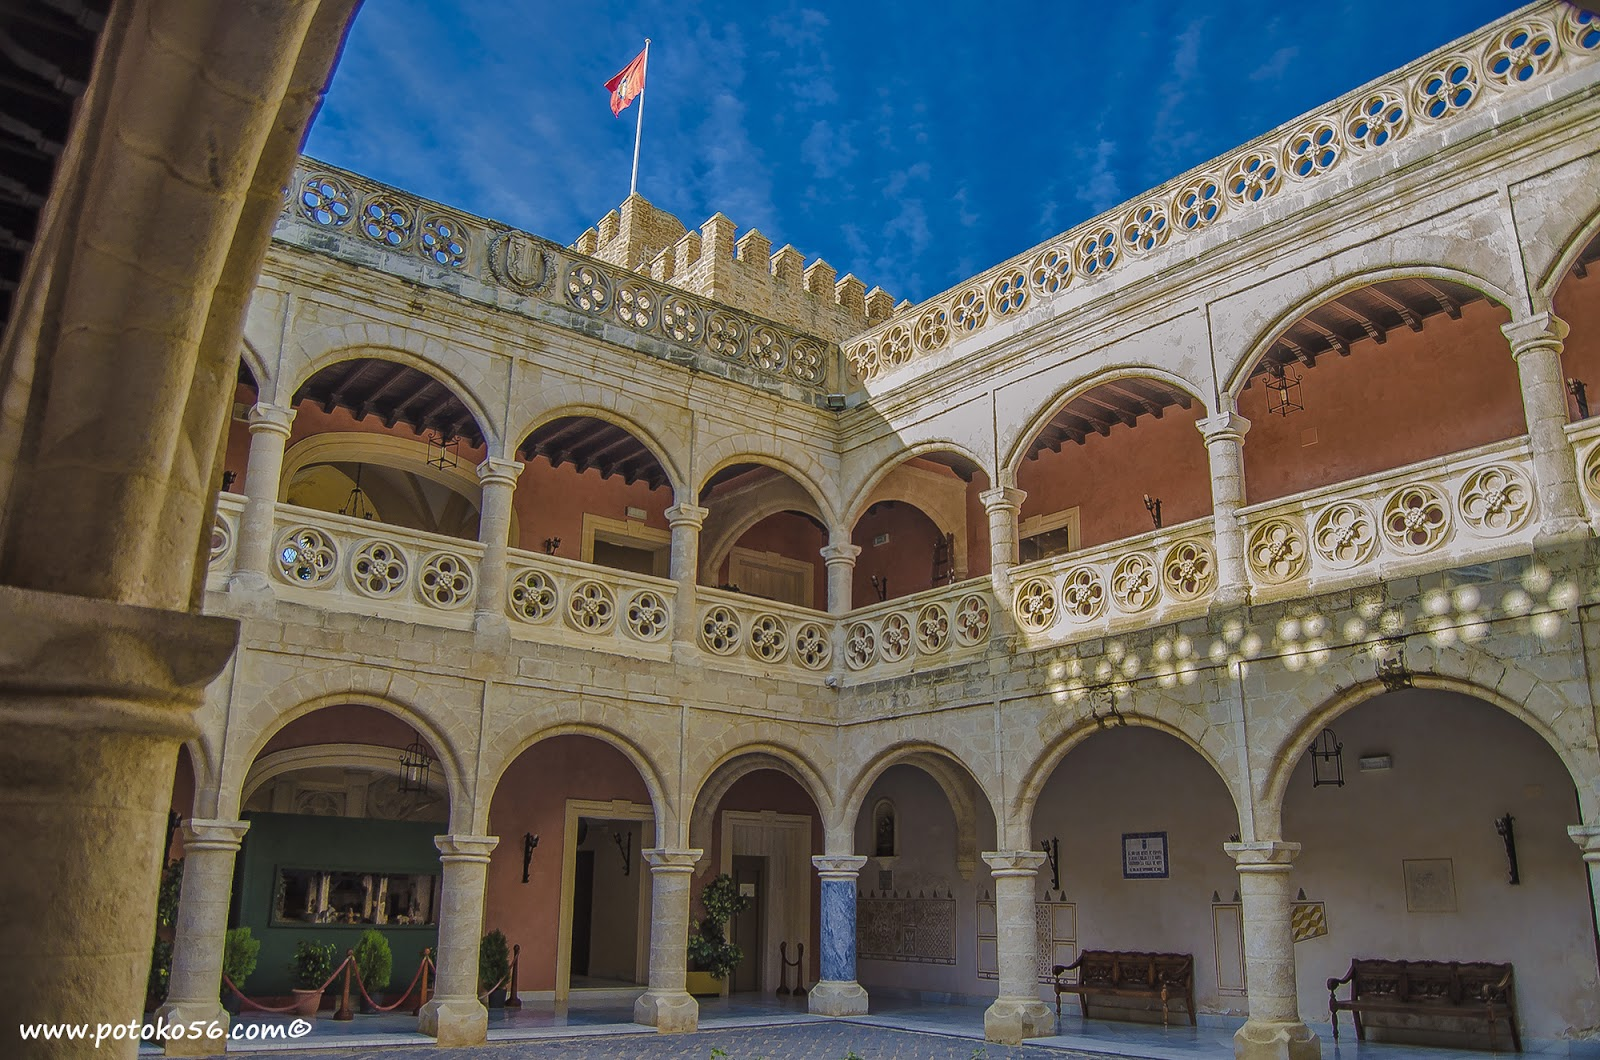 Castillo de Luna patio central Rota